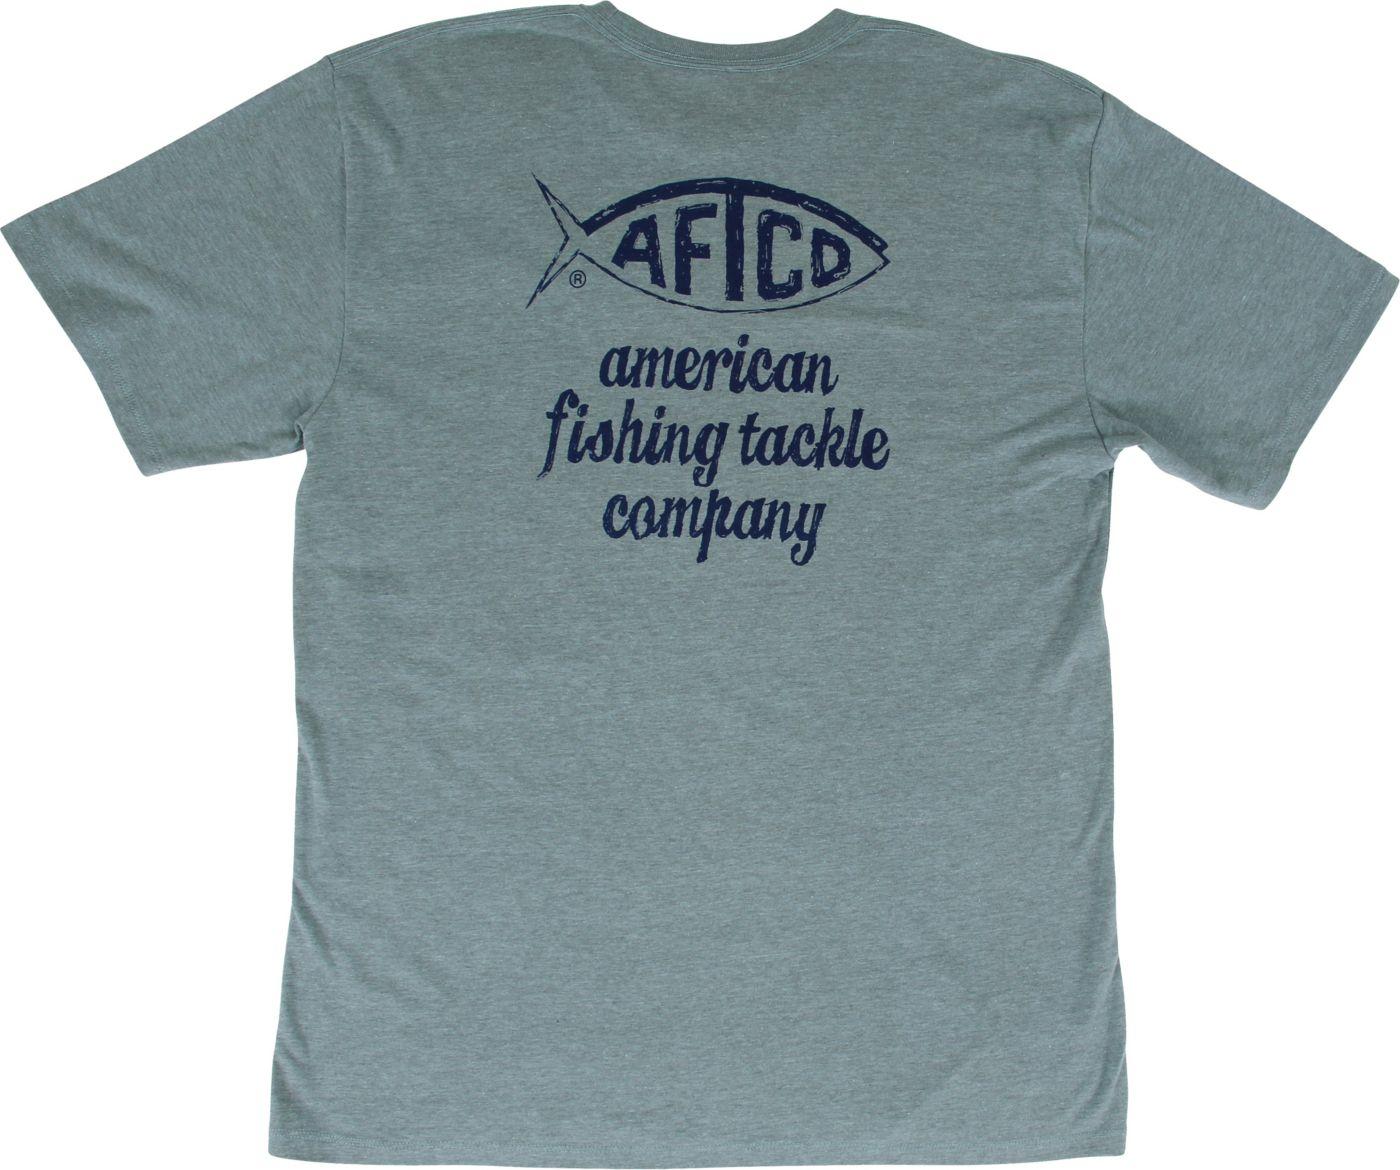 AFTCO Men's Torn Graphic T-Shirt